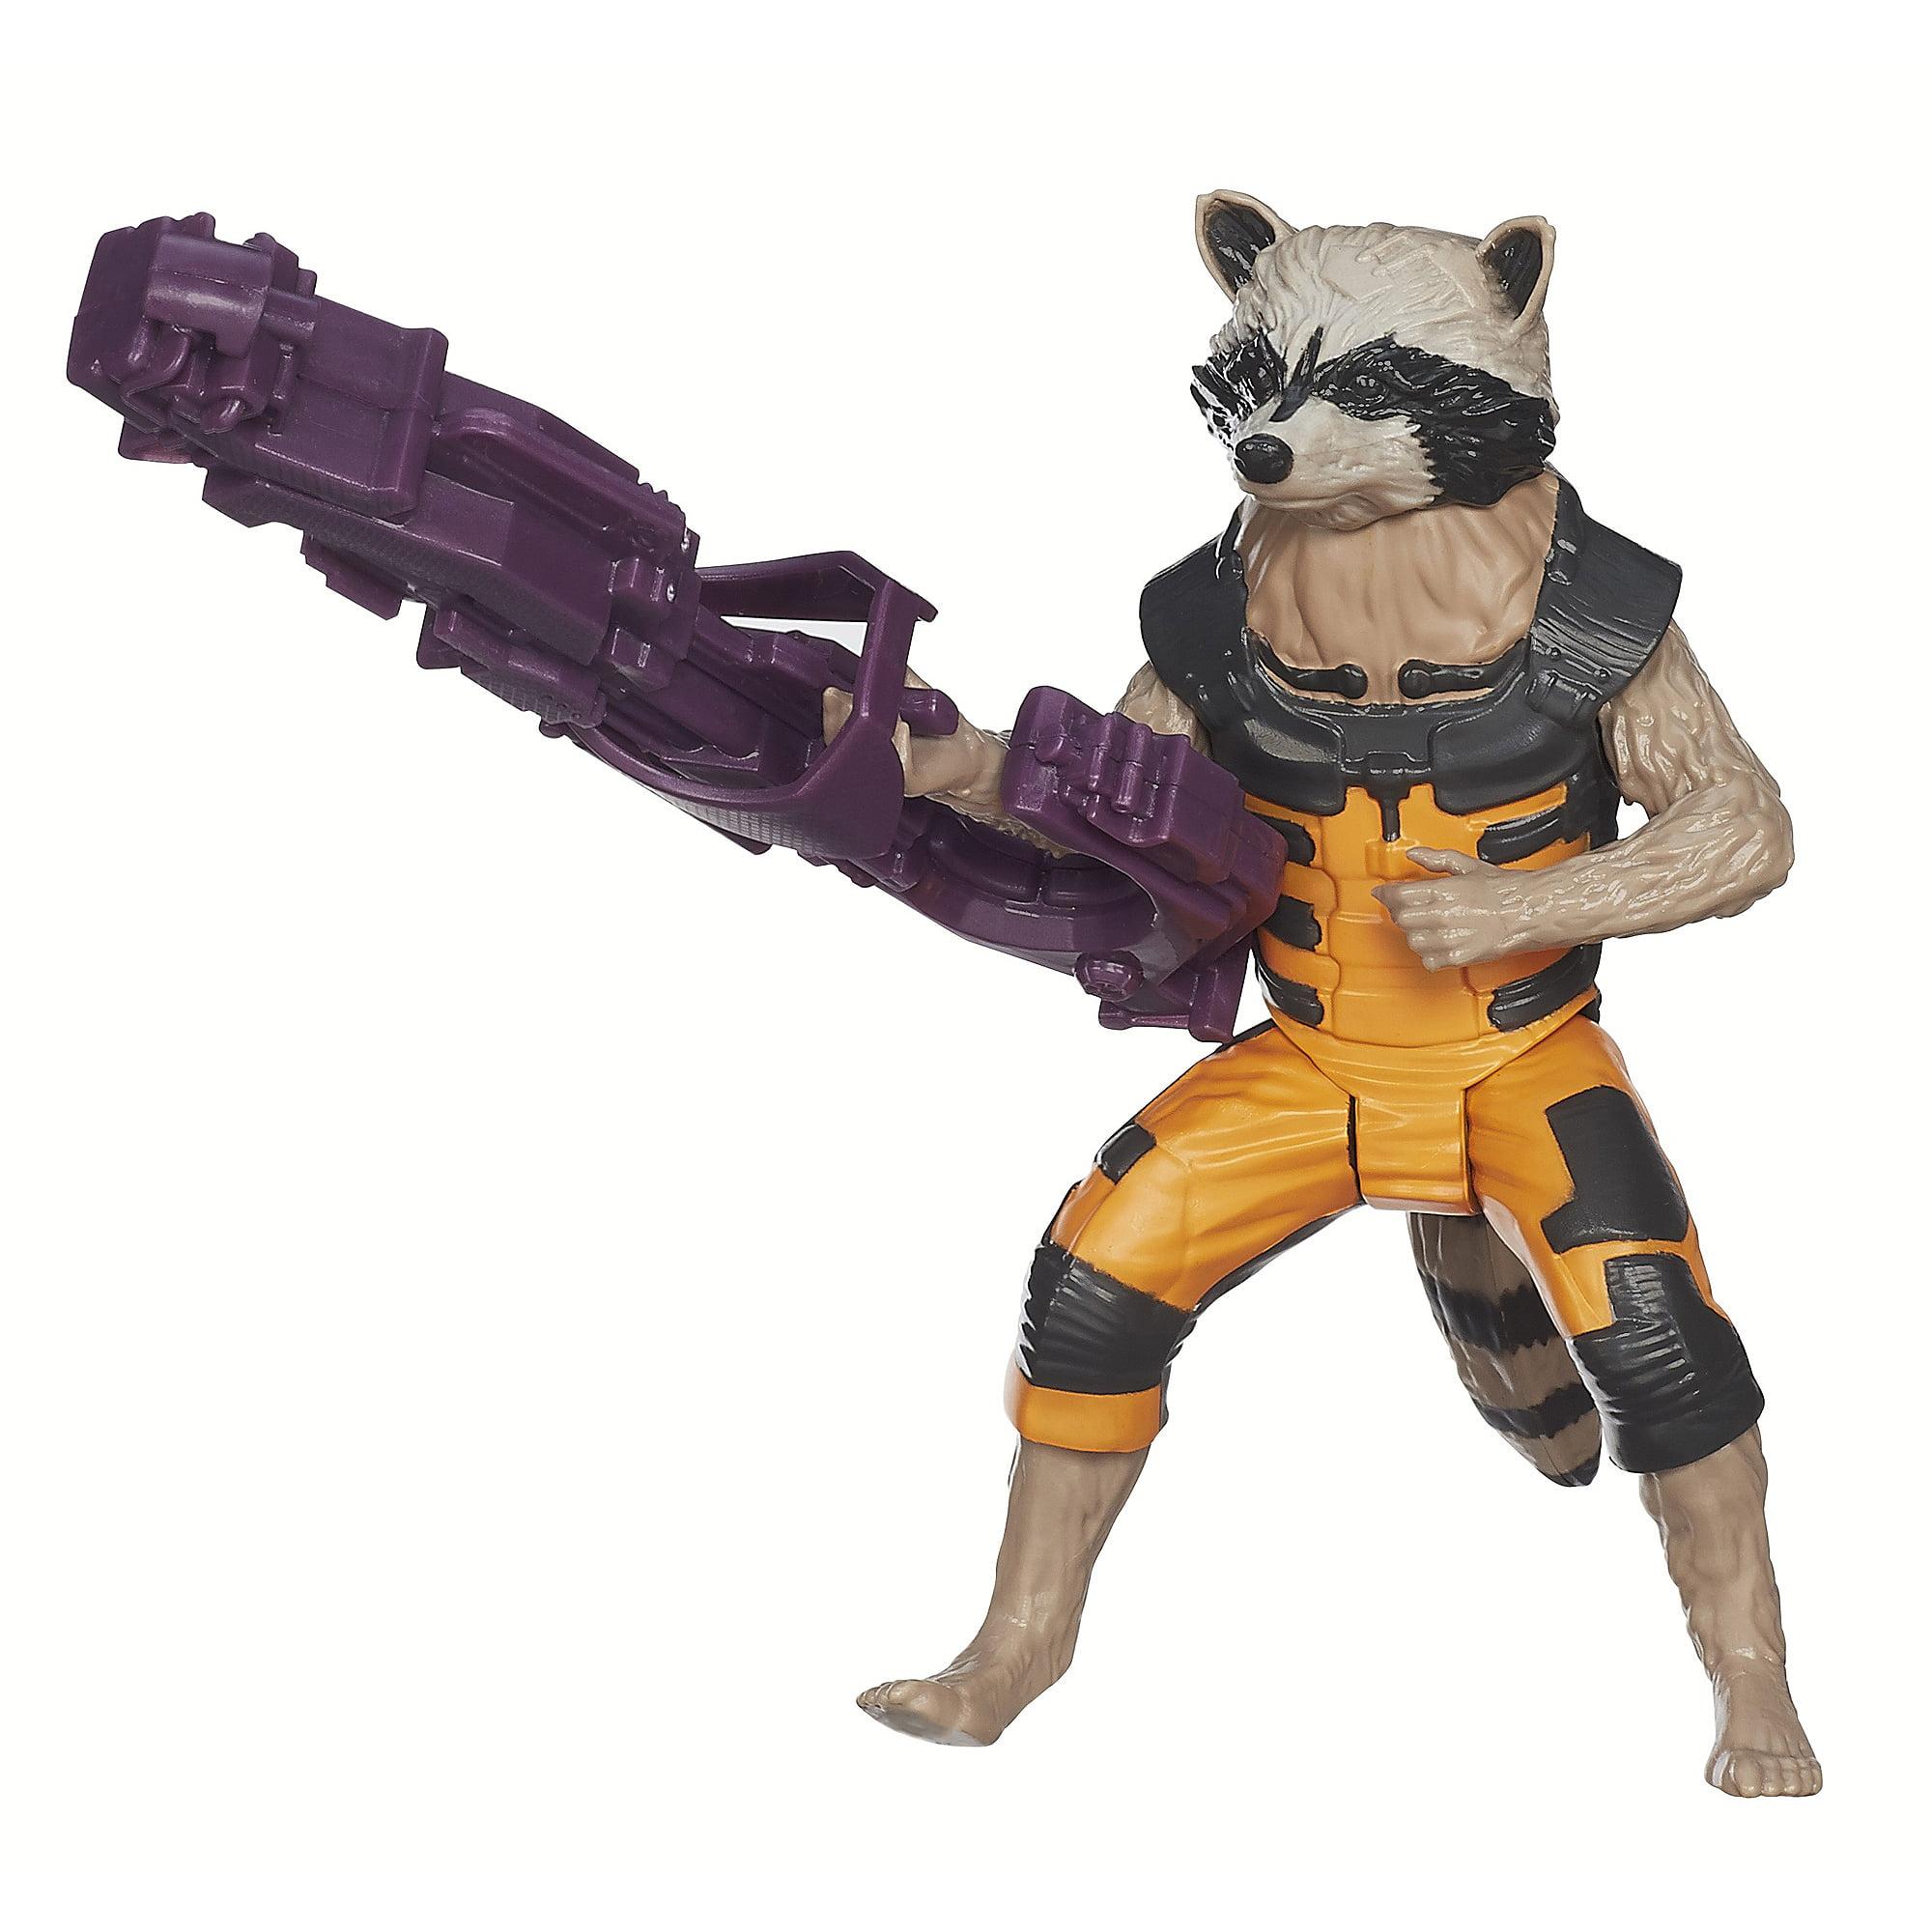 "Marvel Guardians Of The Galaxy Titan Hero Series Rocket Raccoon 12"" Action Figure by Hasbro, Inc."